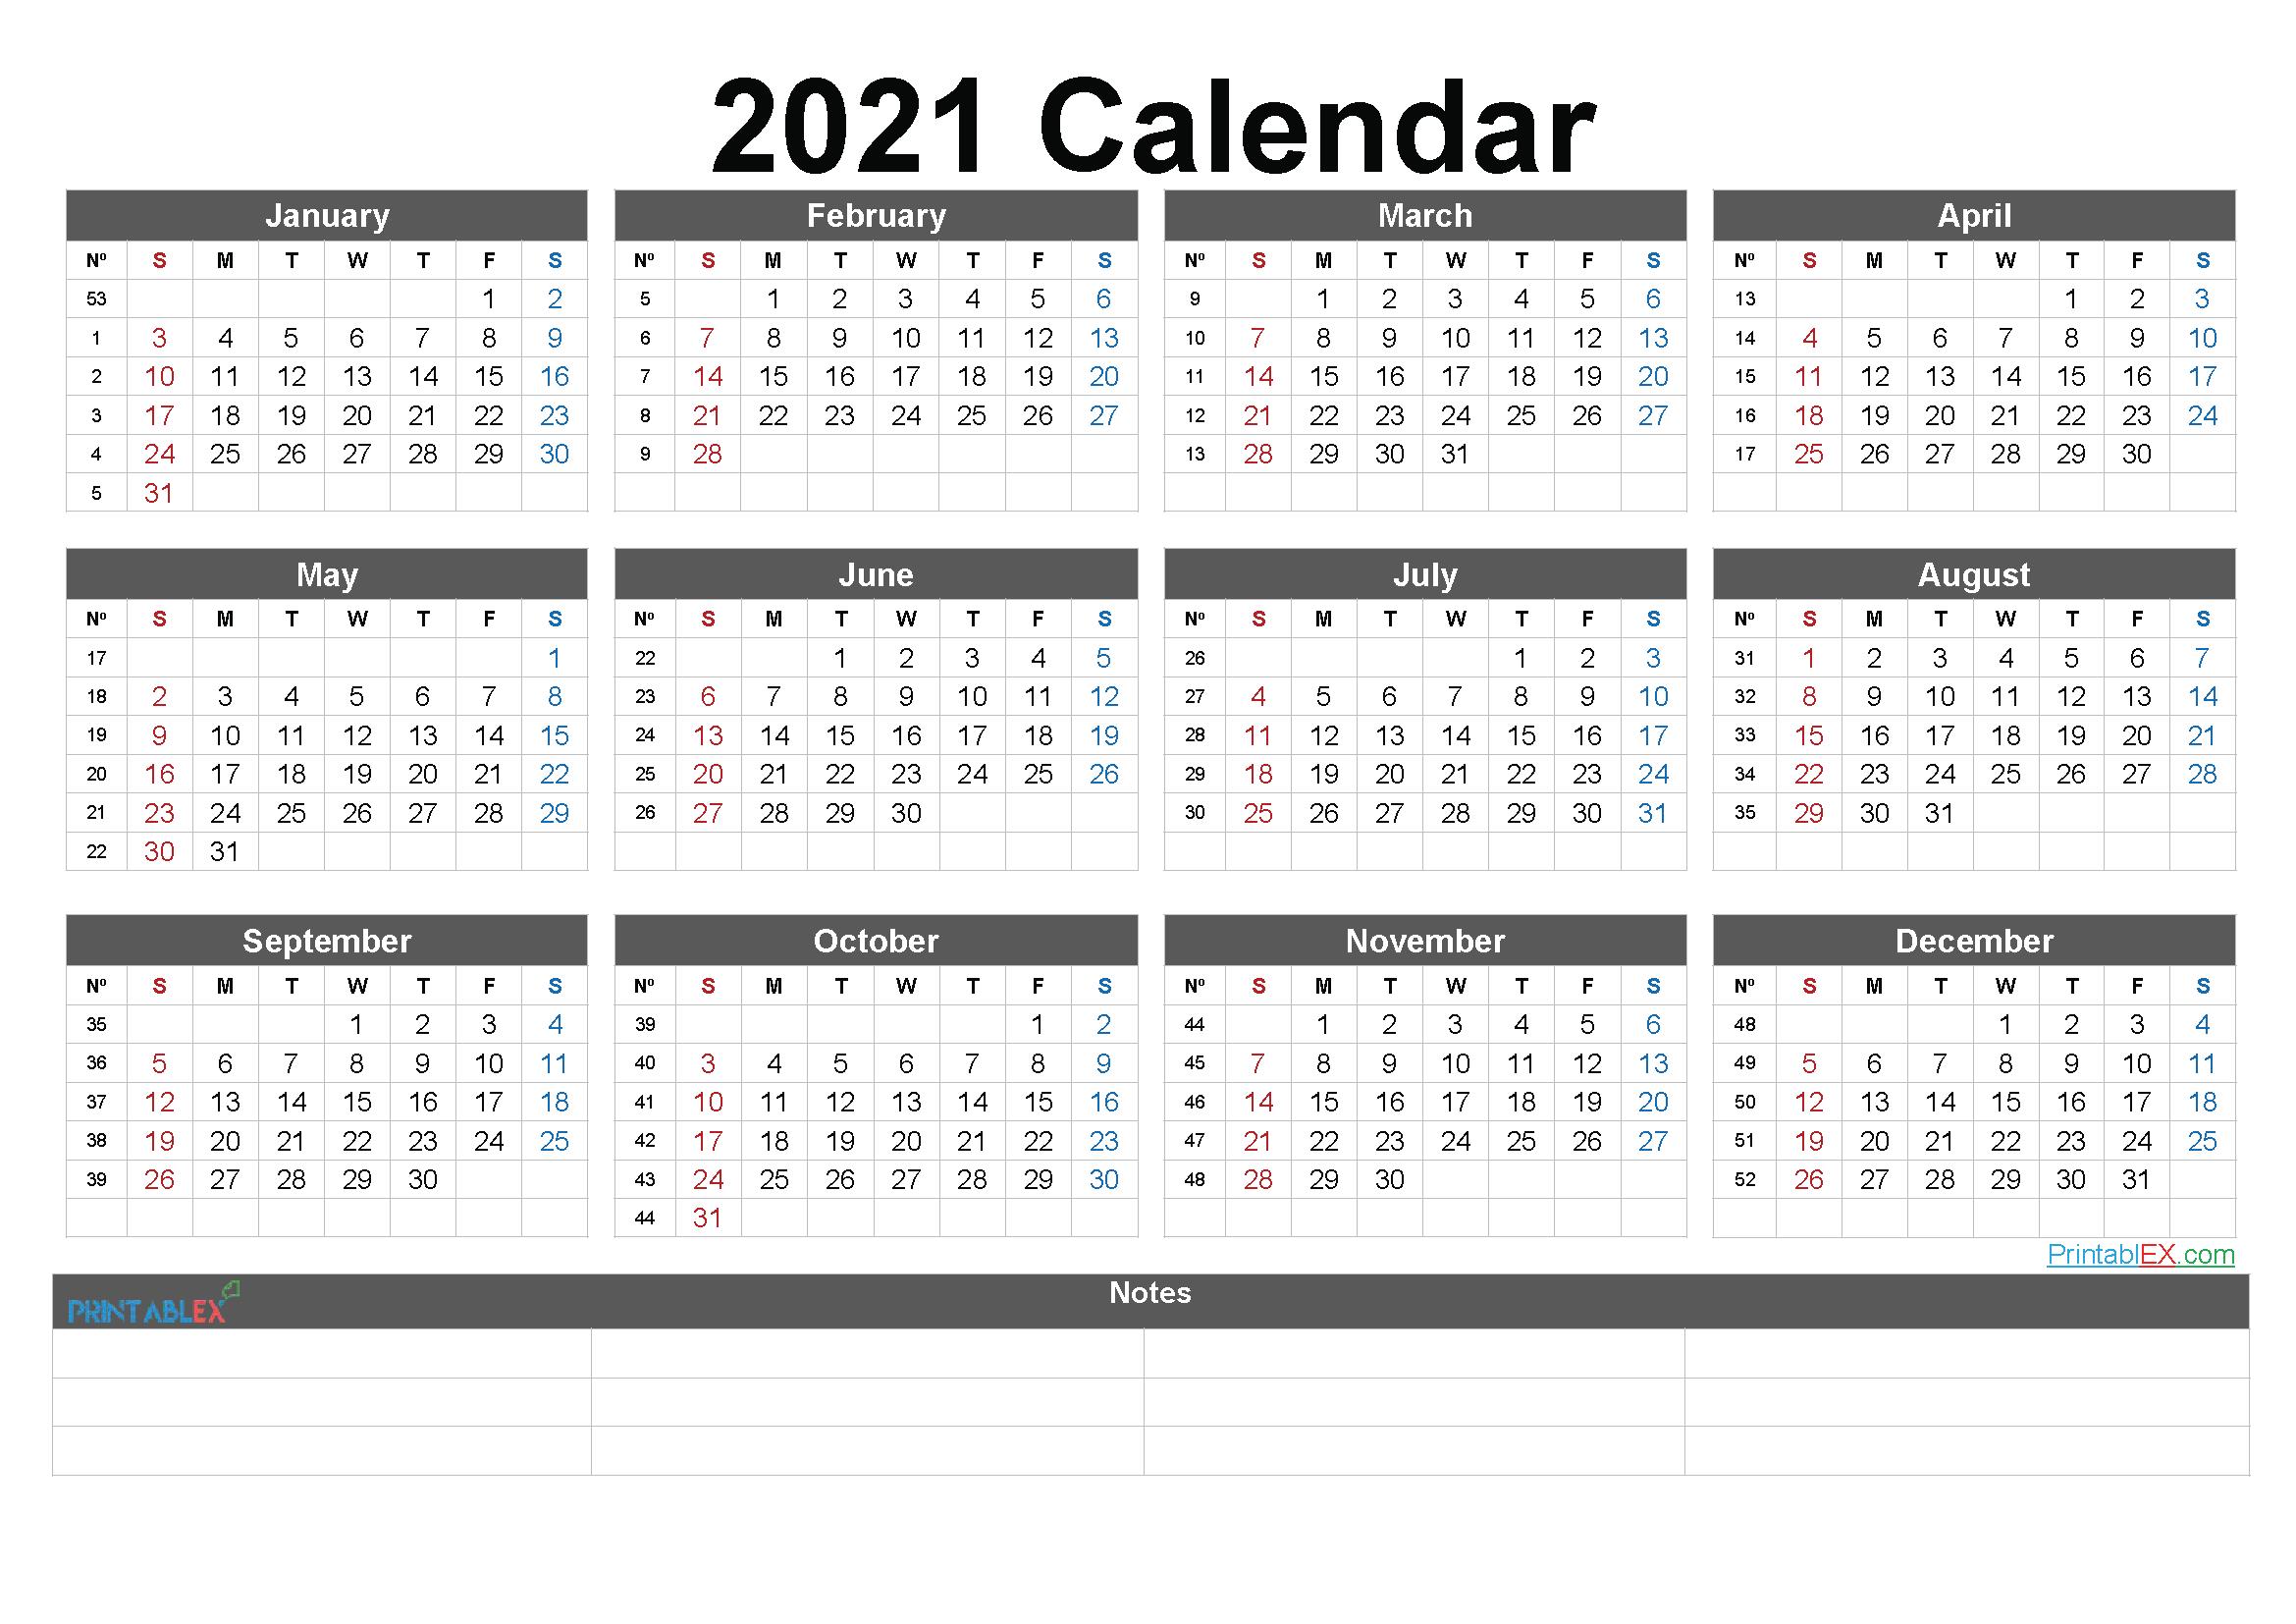 Free Cute Printable Calendar 2021 - 21ytw91